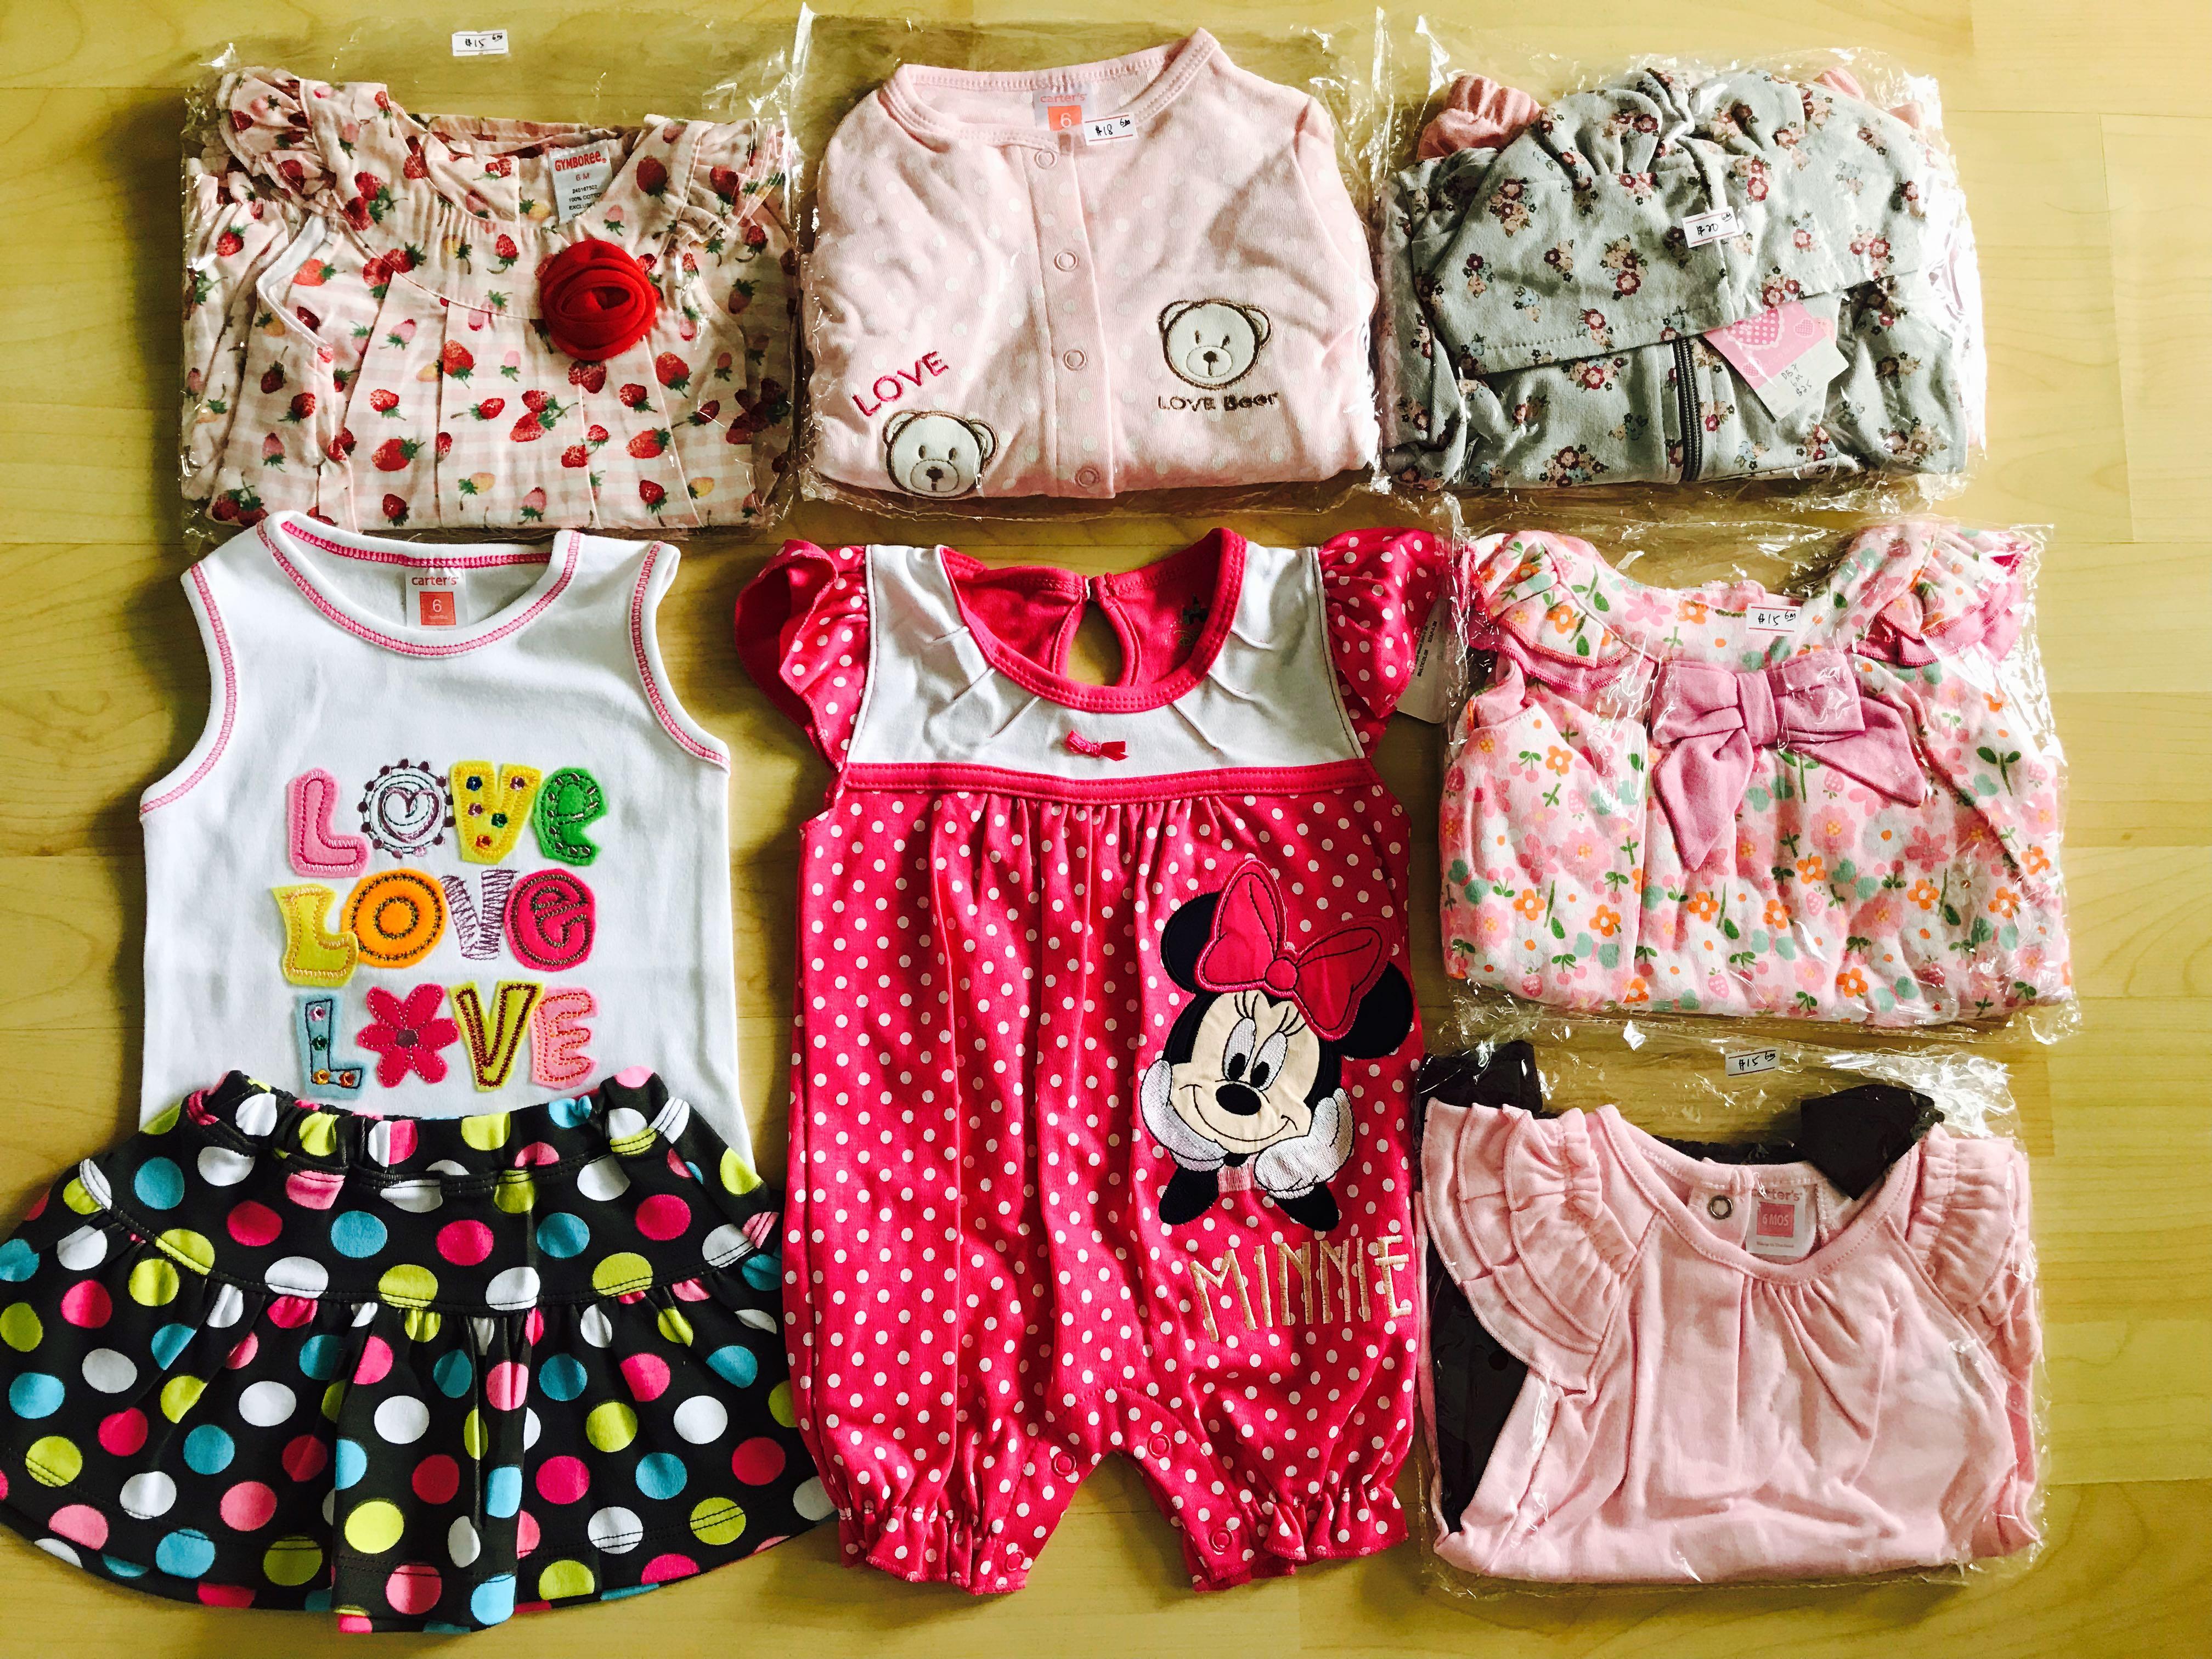 b1e48ba66 6m Baby girls clothing clearance, Babies & Kids, Girls' Apparel, 1 ...